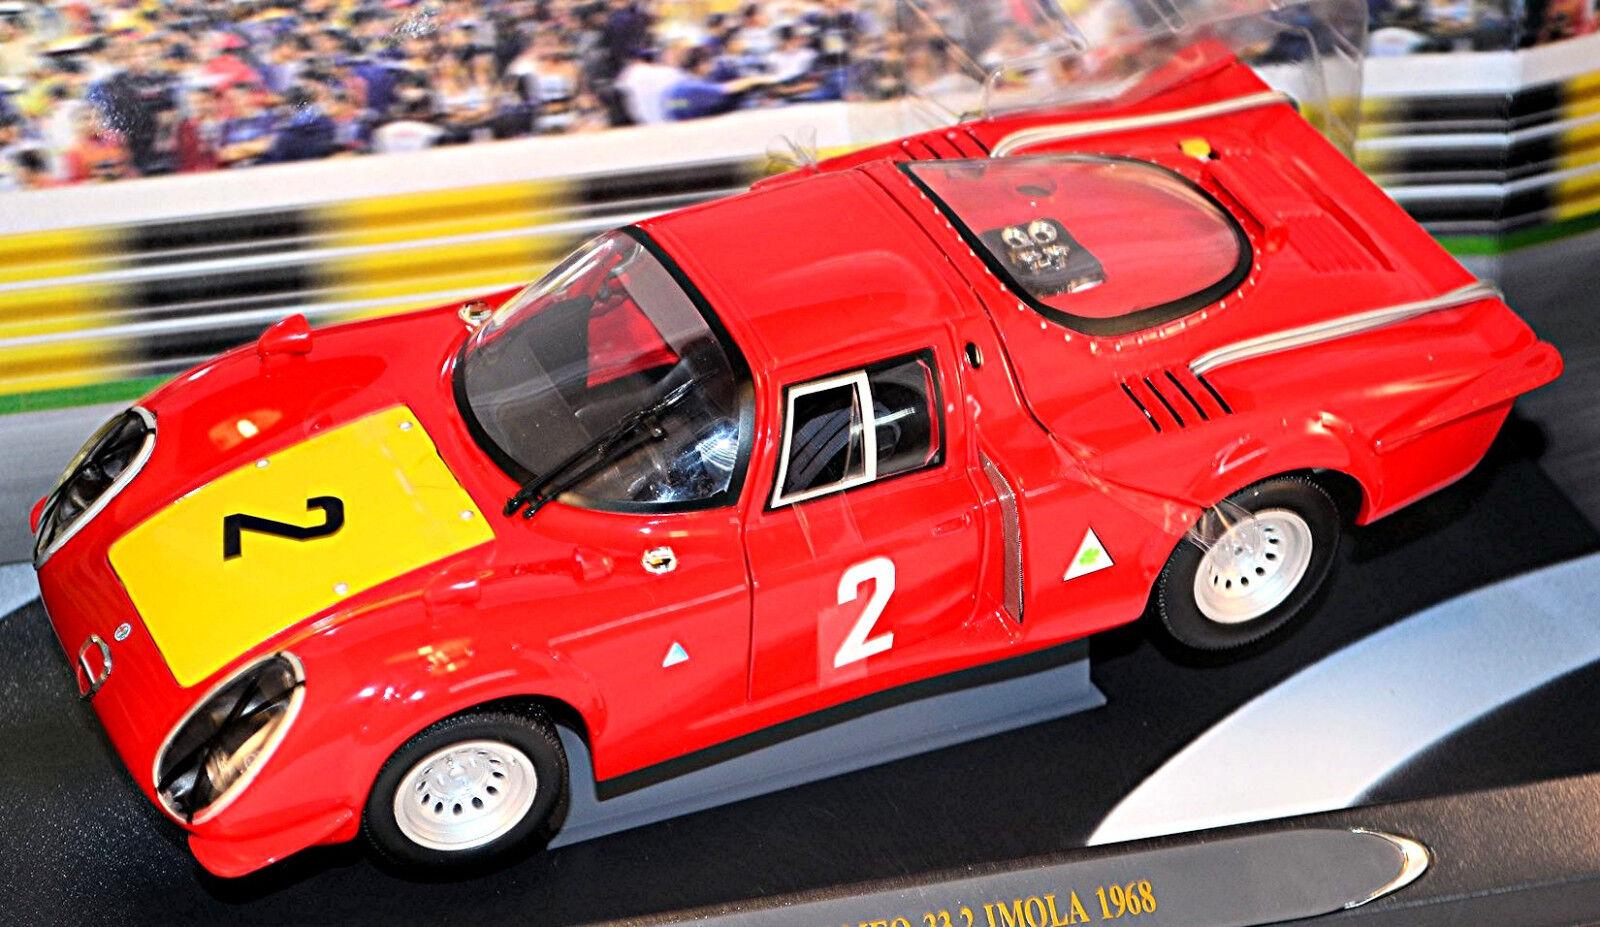 ALFA ROMEO 33.2 33.2 33.2 DAYTONA Coupé  2 IMOLA 1968 Rojo Rojo 1 18 ricko e9d01b